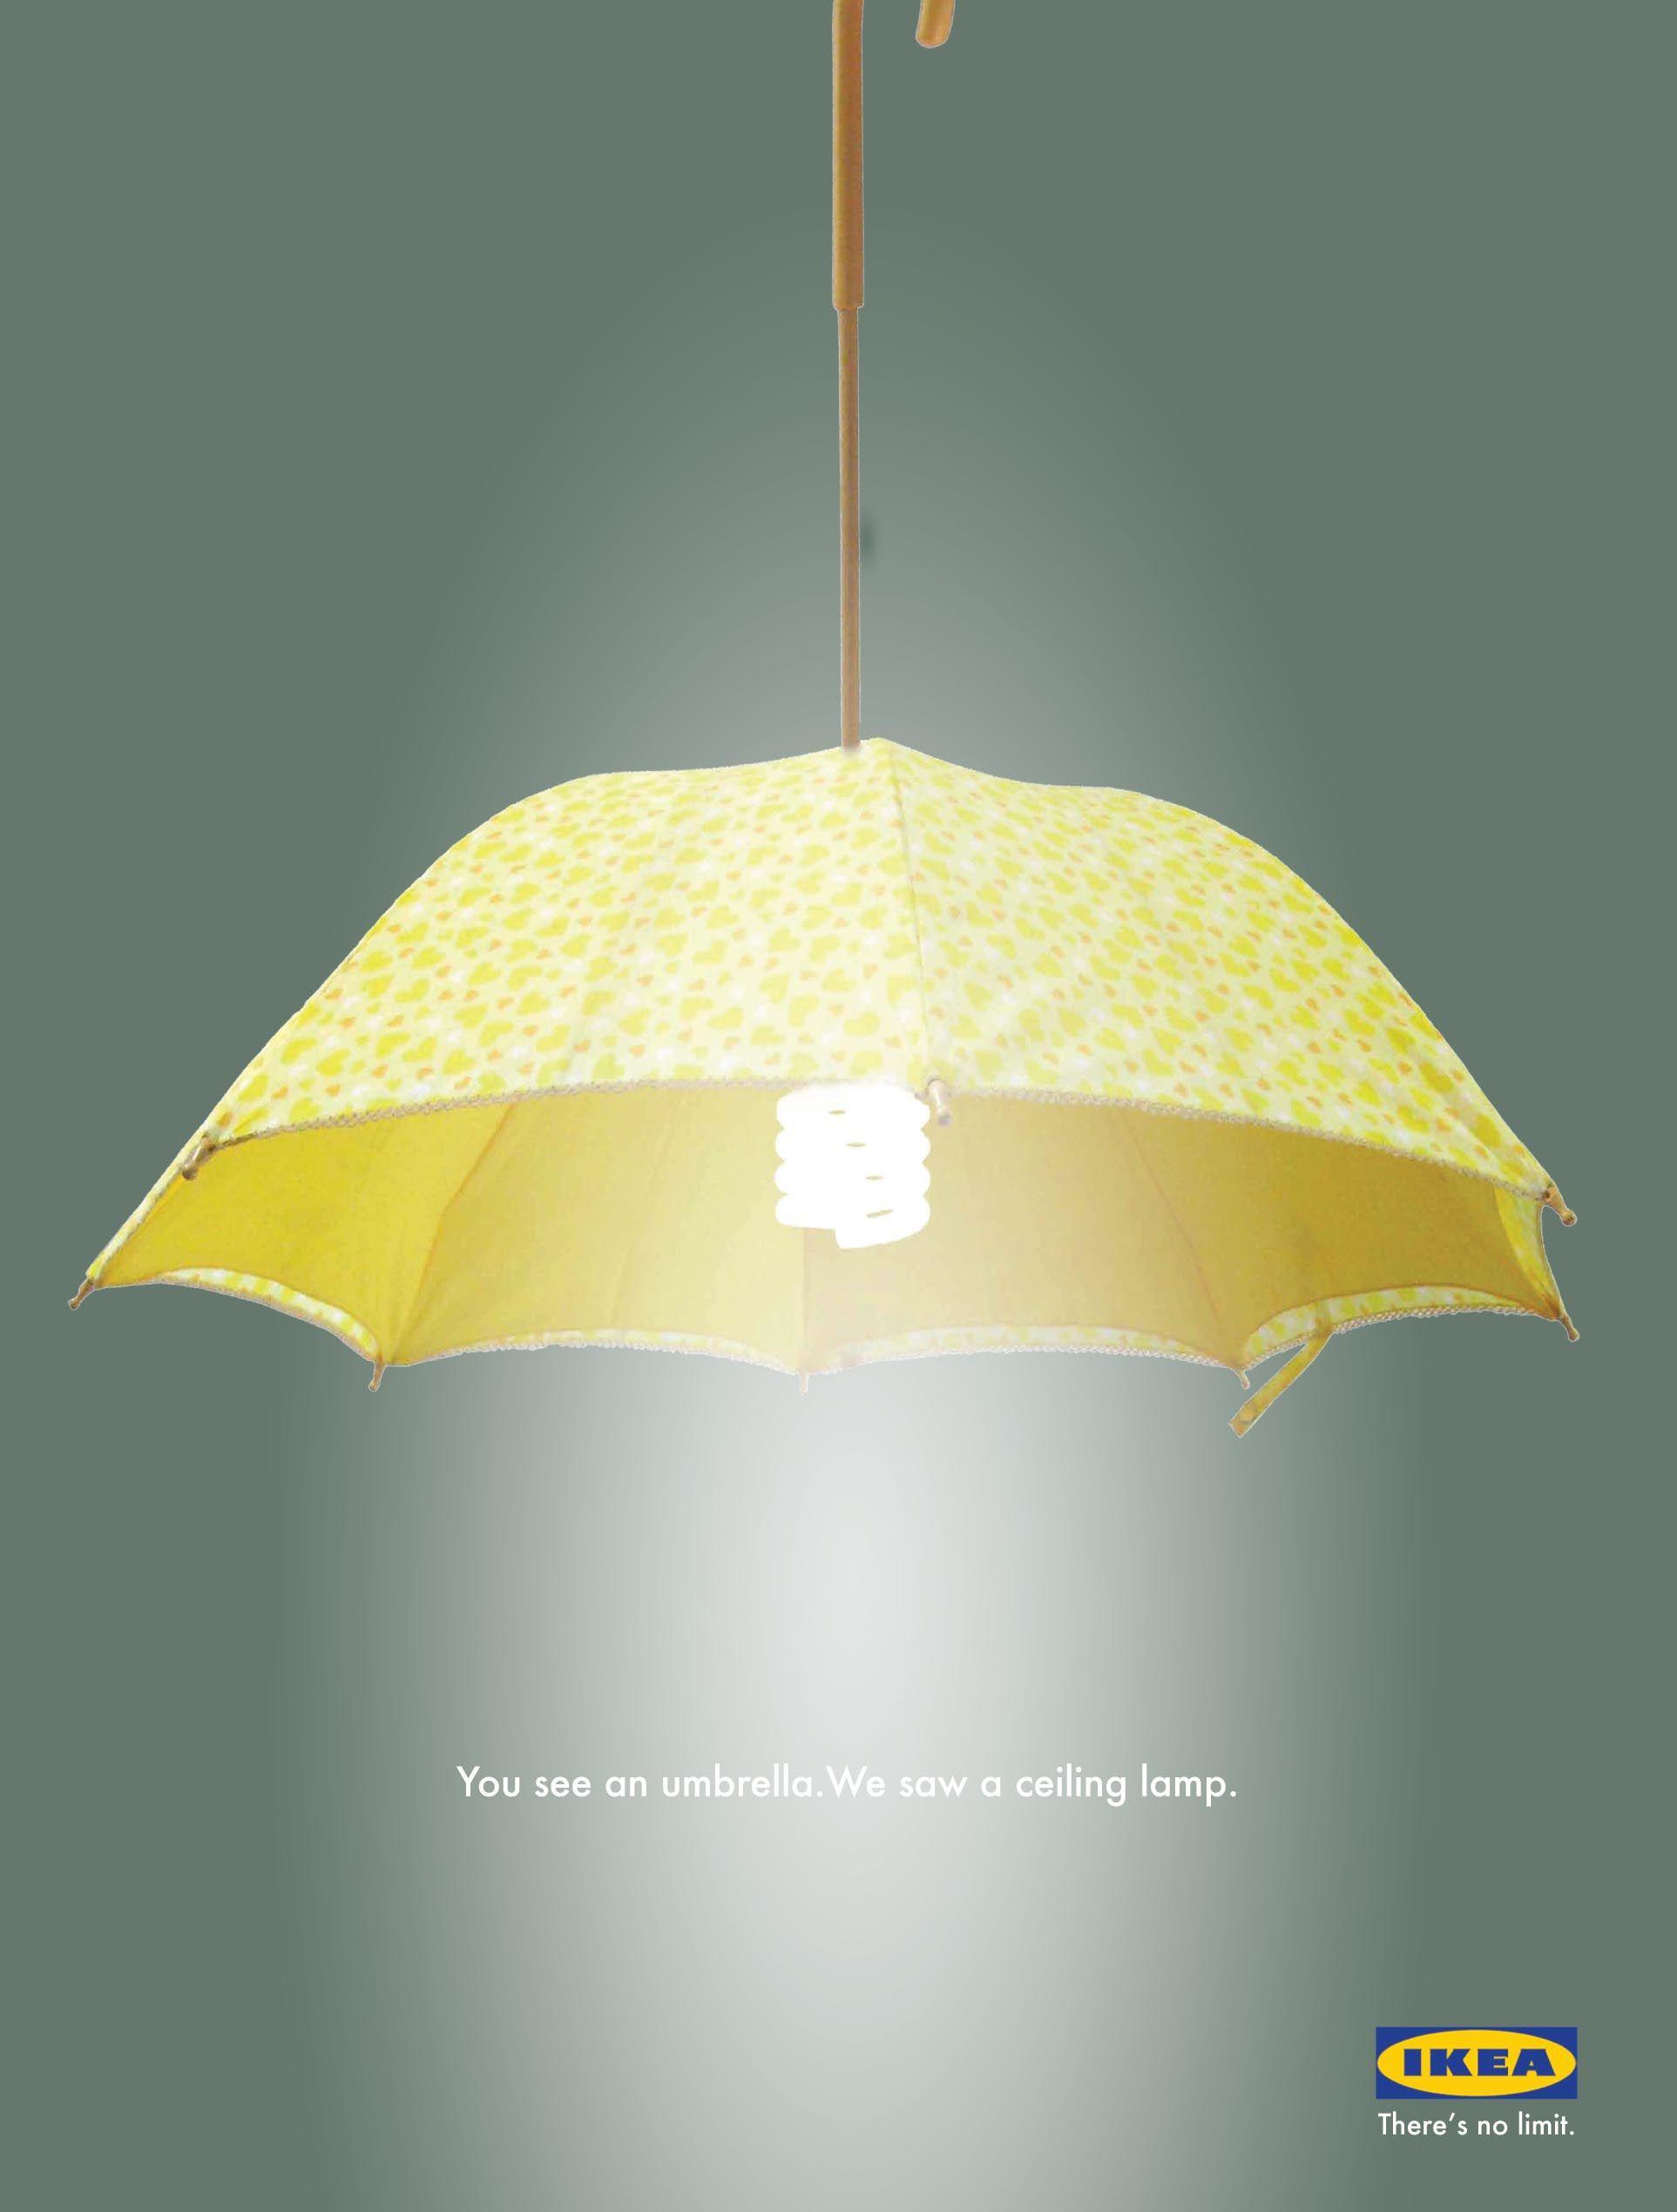 m cantilever product umbrella lights proshade full unit lighting open ft price